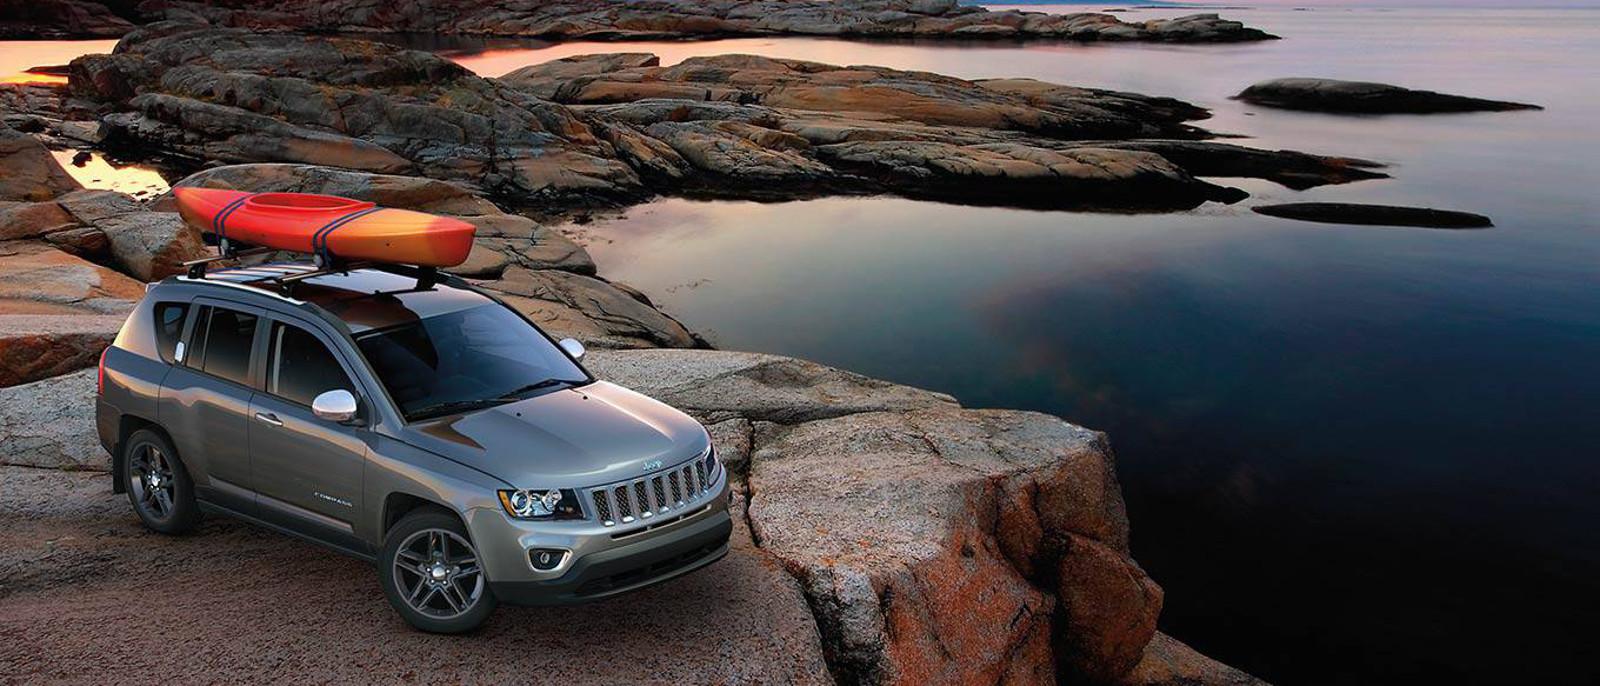 2014 Jeep Compass Exterior